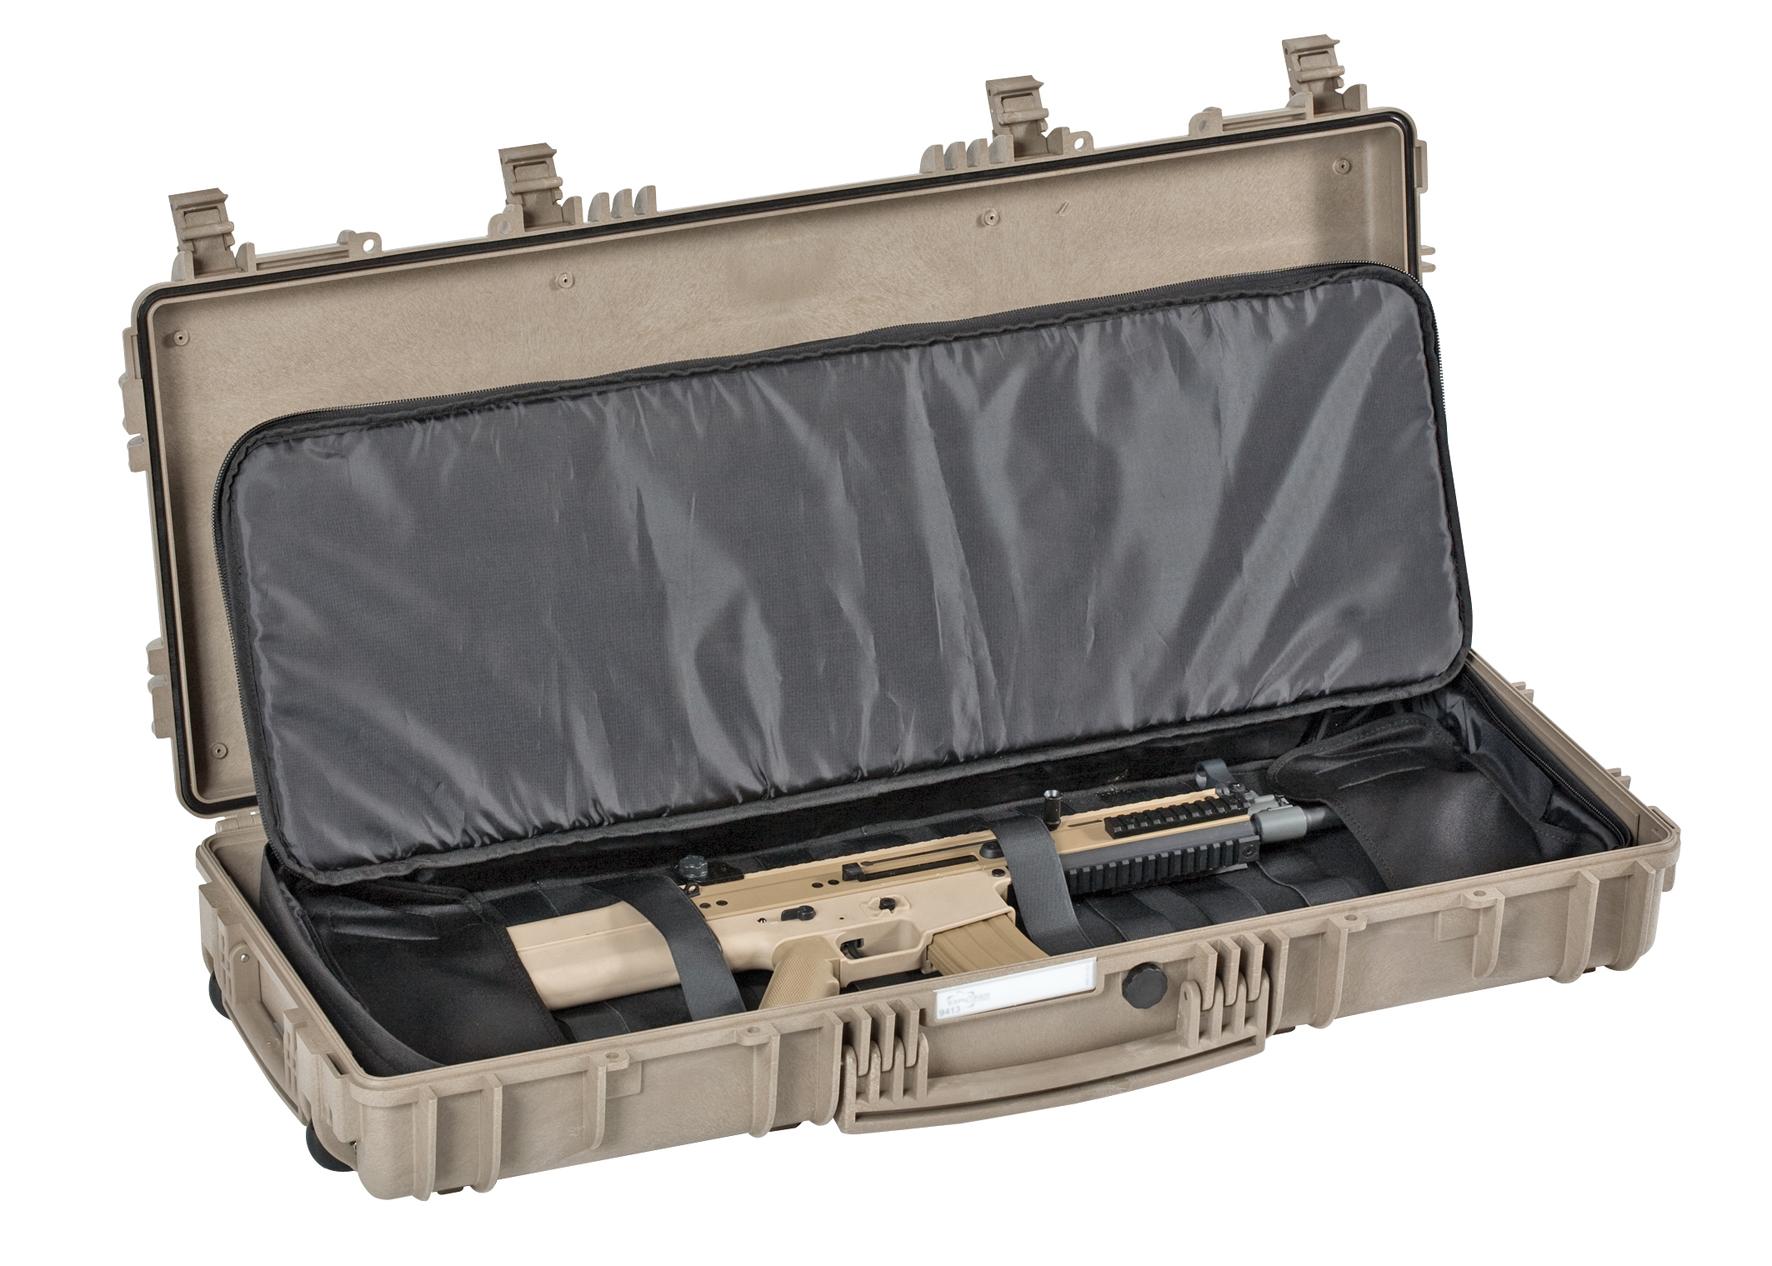 malette pour fusil explorer transport d 39 armes. Black Bedroom Furniture Sets. Home Design Ideas